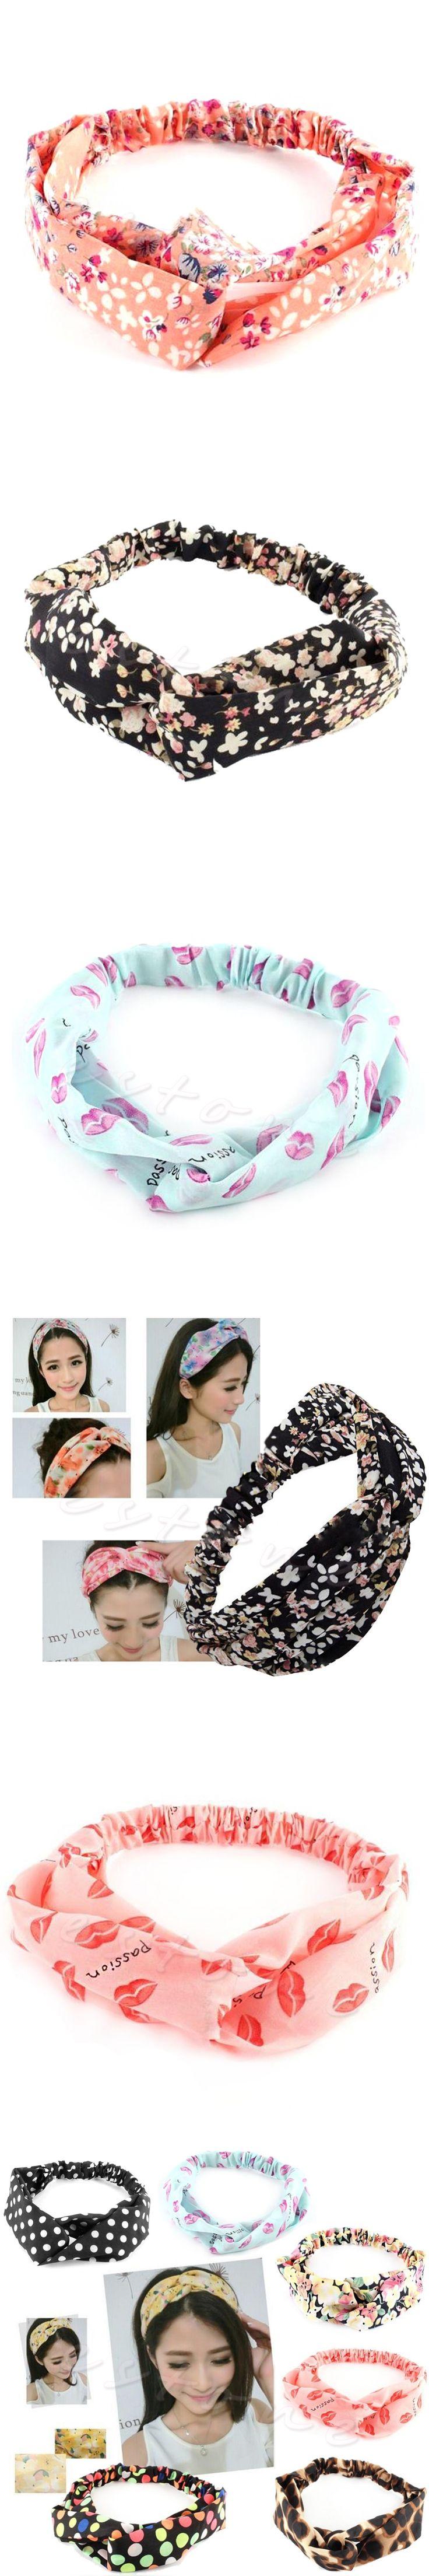 2017 korea style Women Cotton Turban Twist Knot elastic Head Wrap Headband floral print Twisted Knotted Hair Band woman headwear